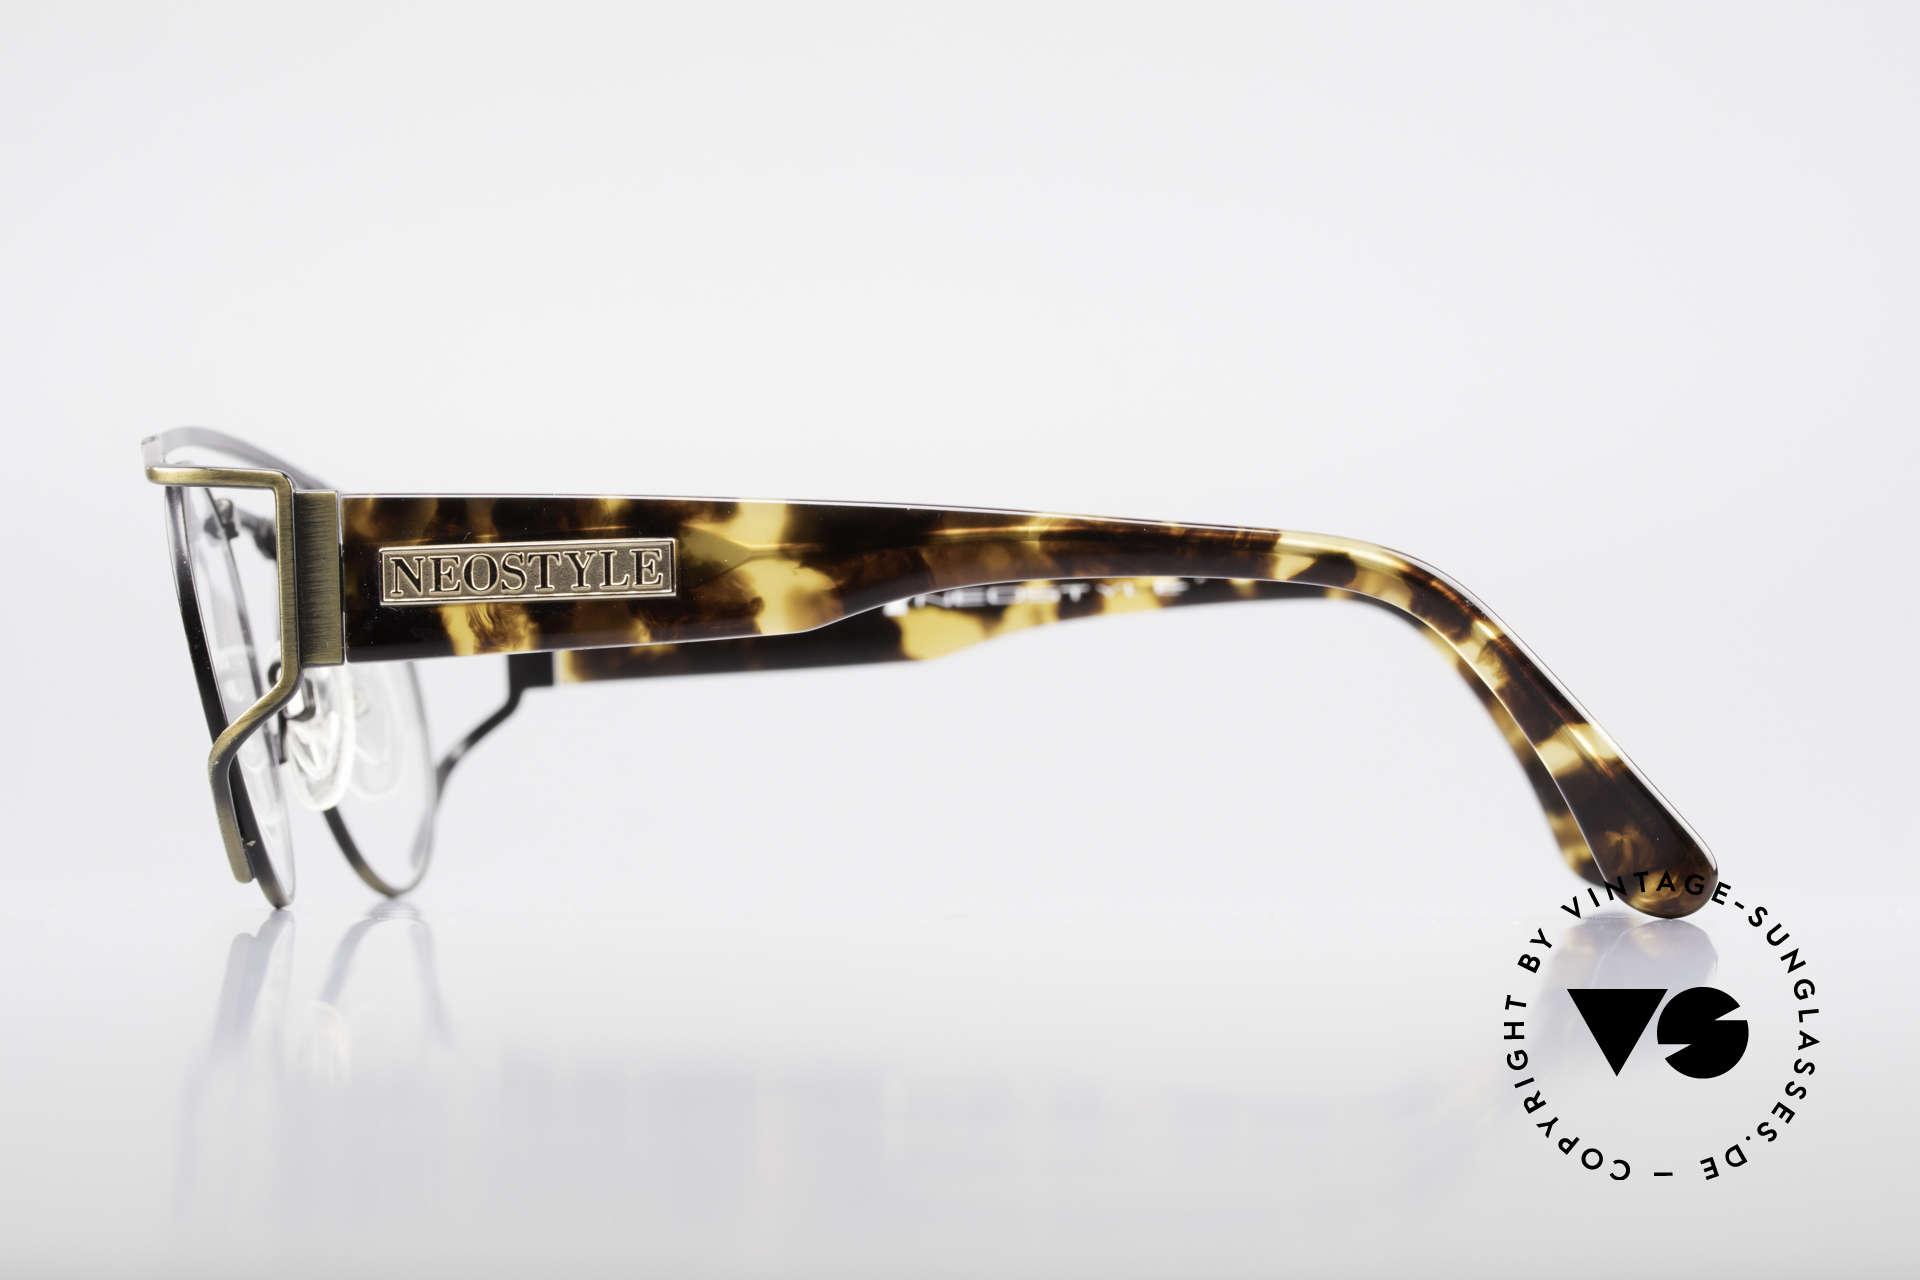 Neostyle Superstar 1 Steampunk Vintage Eyeglasses, Size: medium, Made for Men and Women